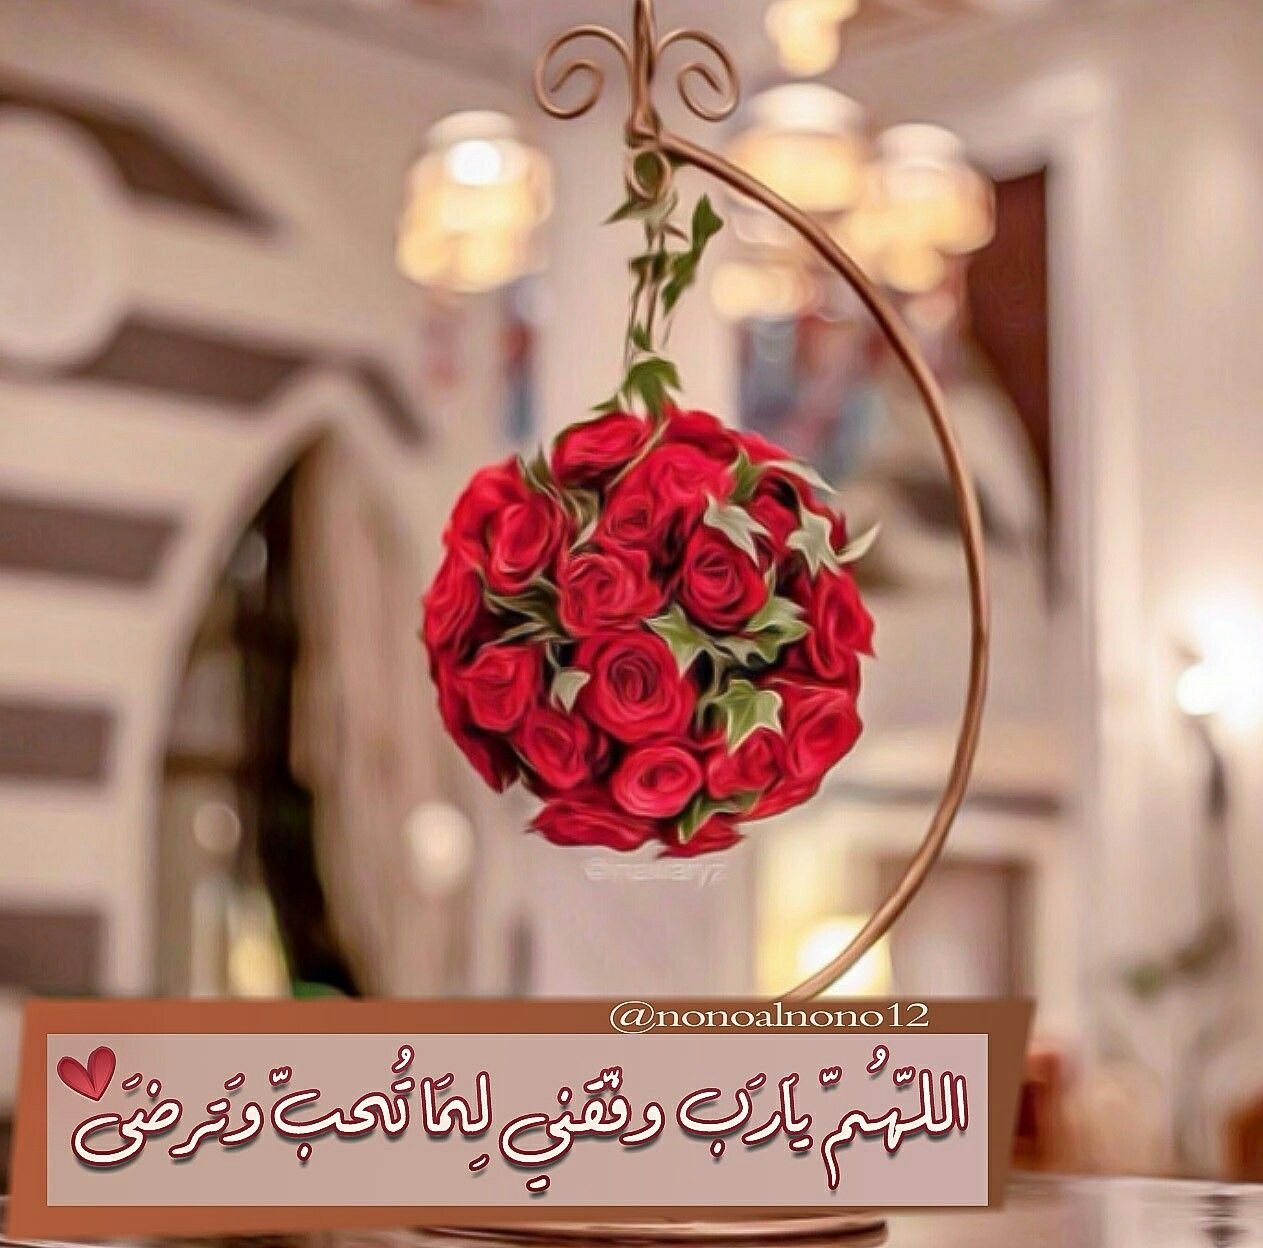 اللهم وفقني Islamic Pictures Islam Facts Islam